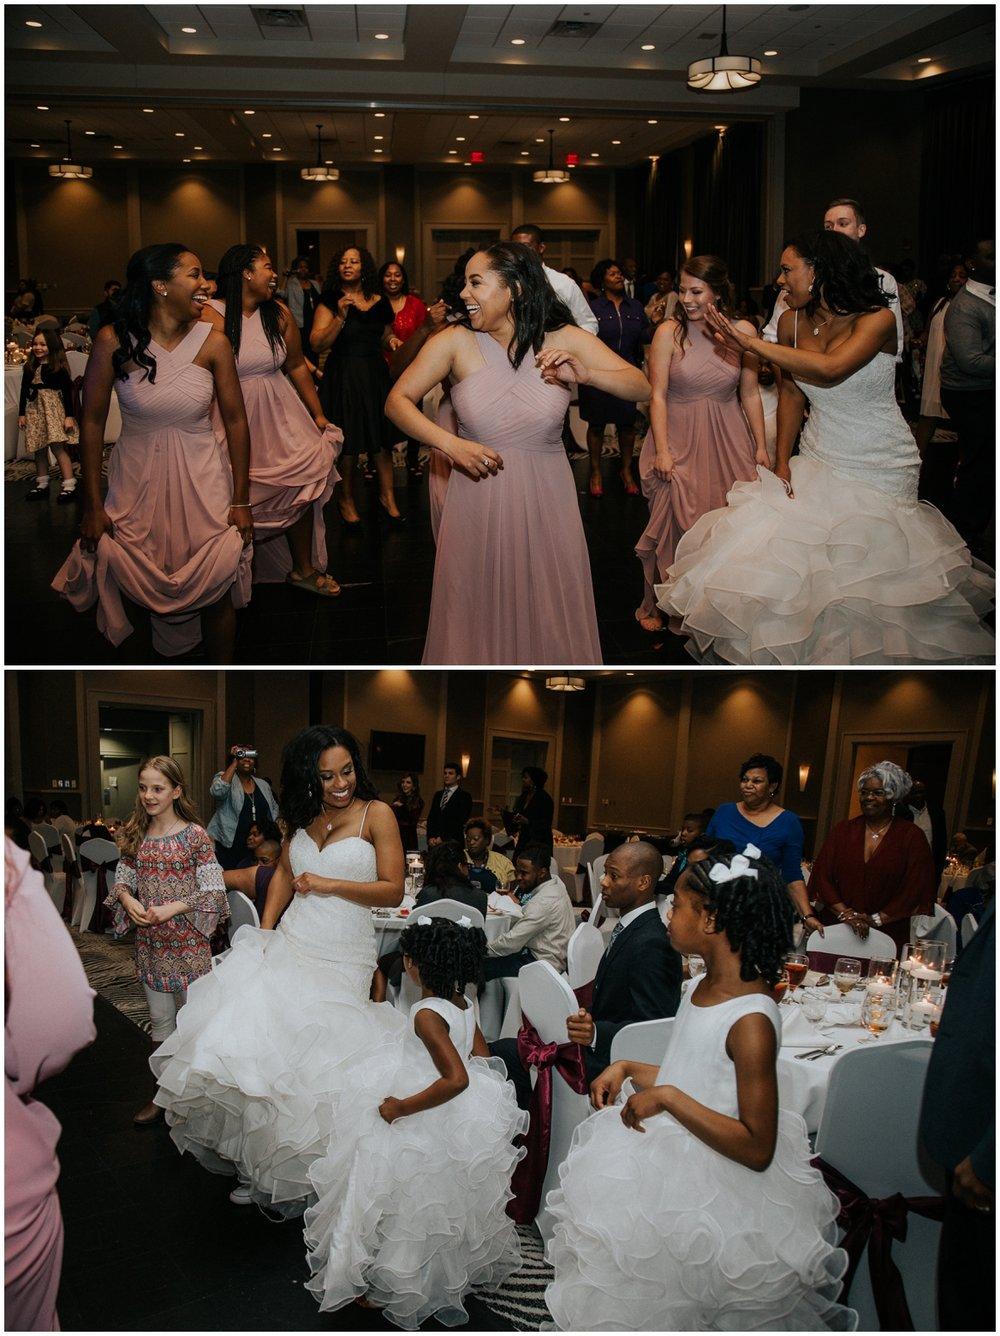 shipley_memphis_wedding_photographer_79.jpg